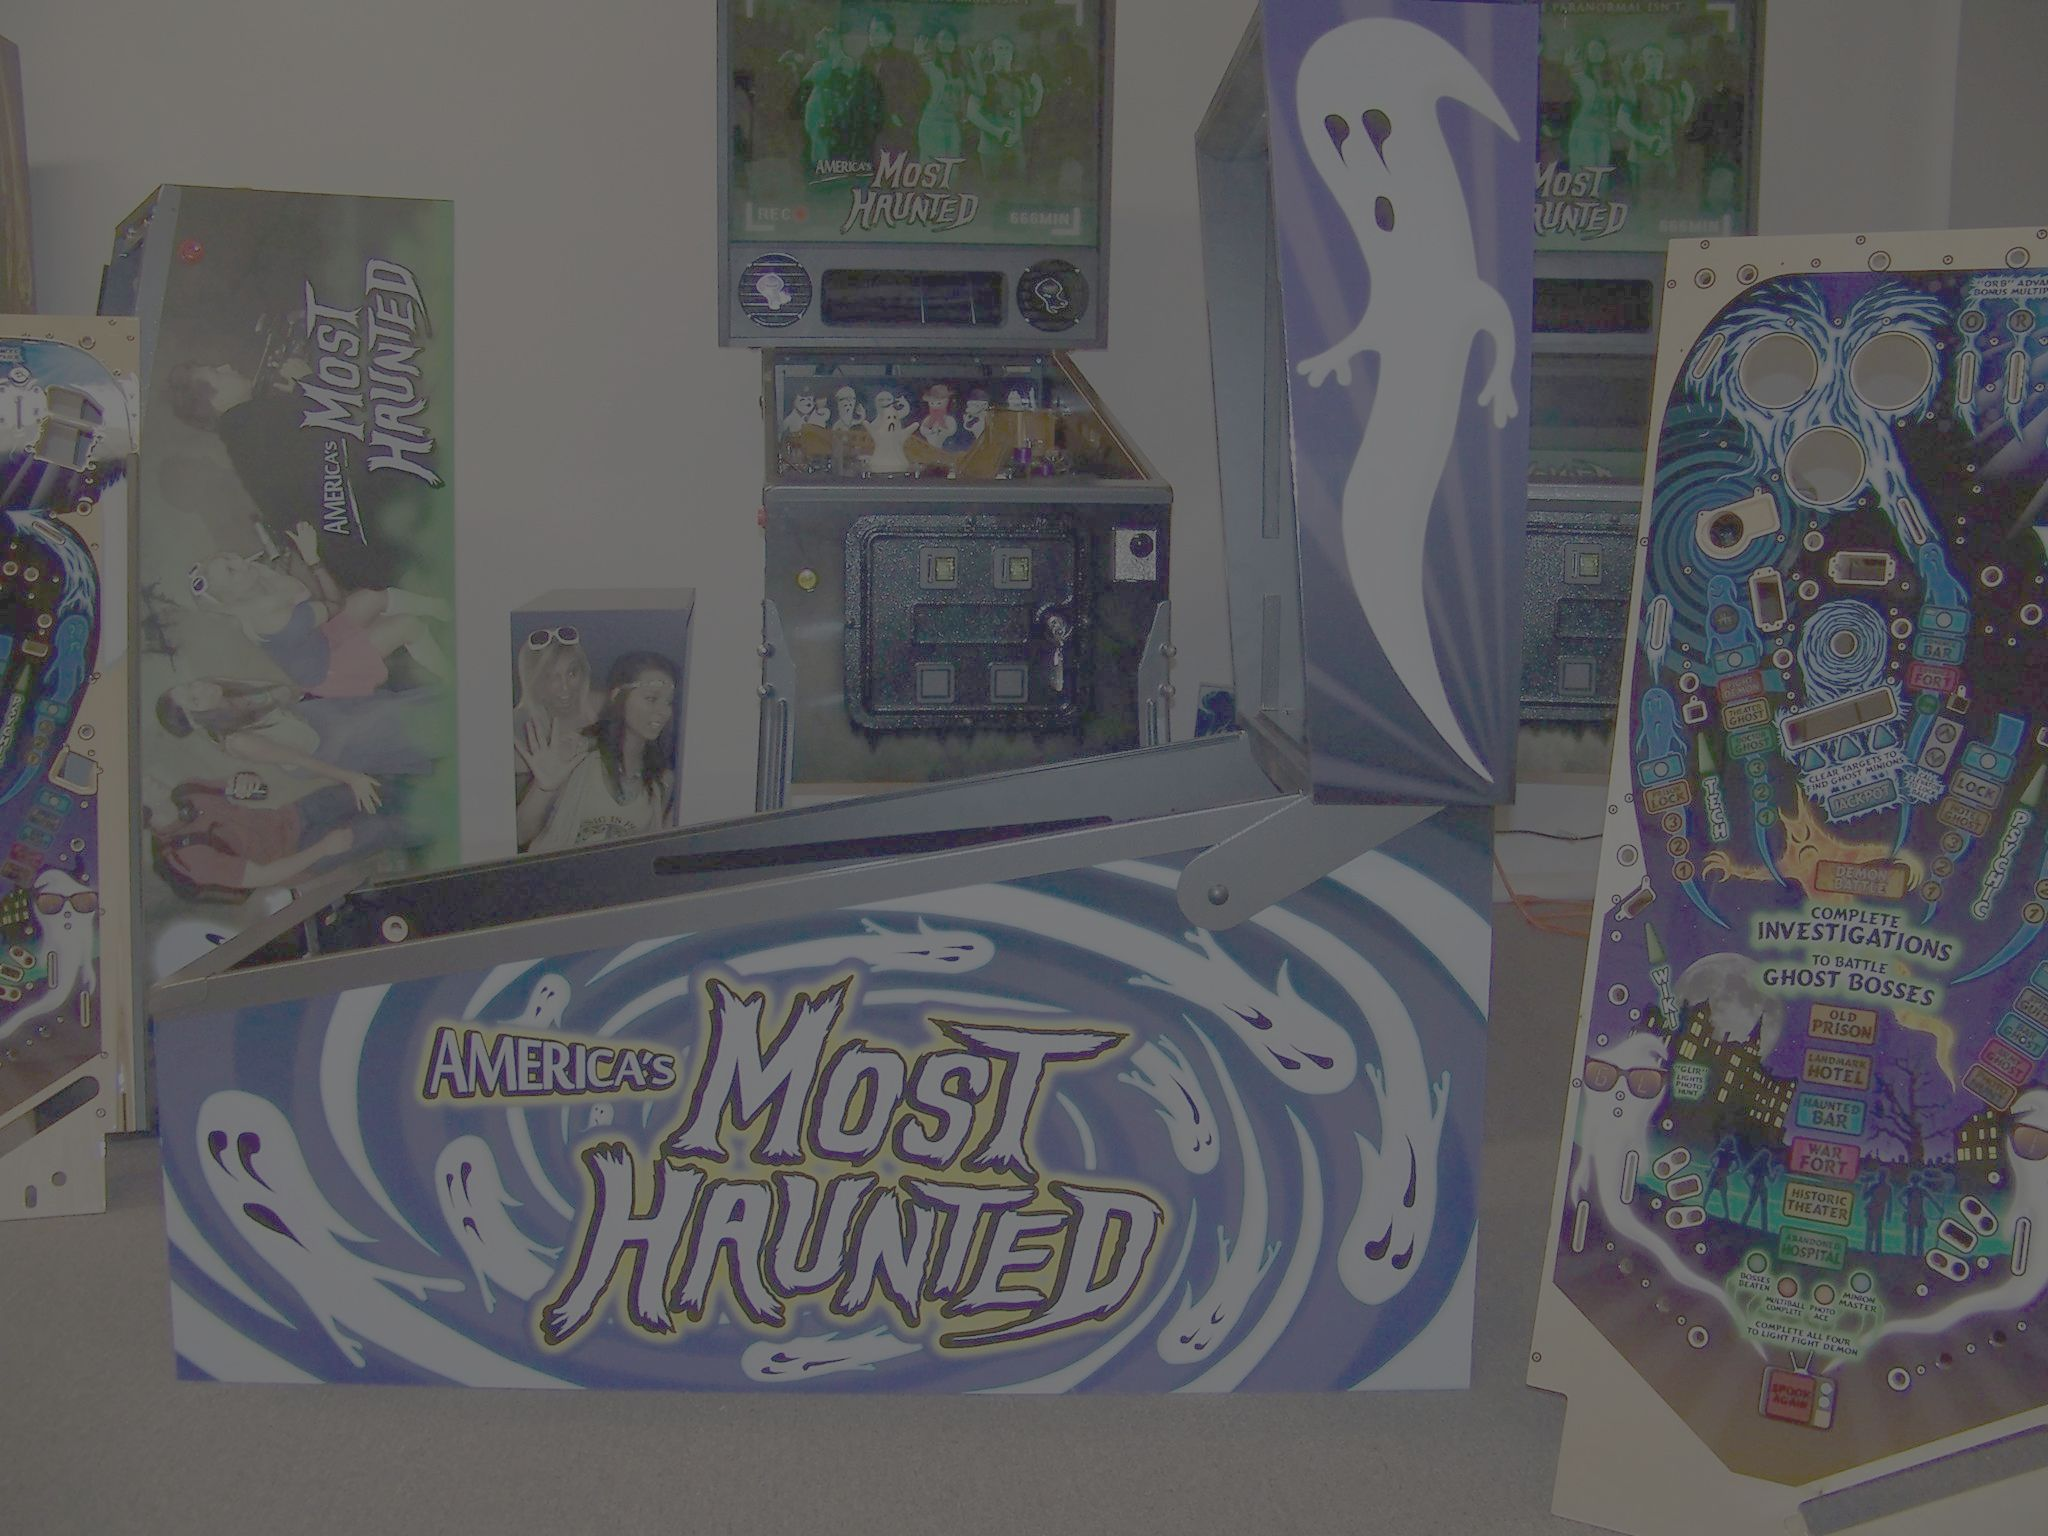 America's Most Haunted Promo Video